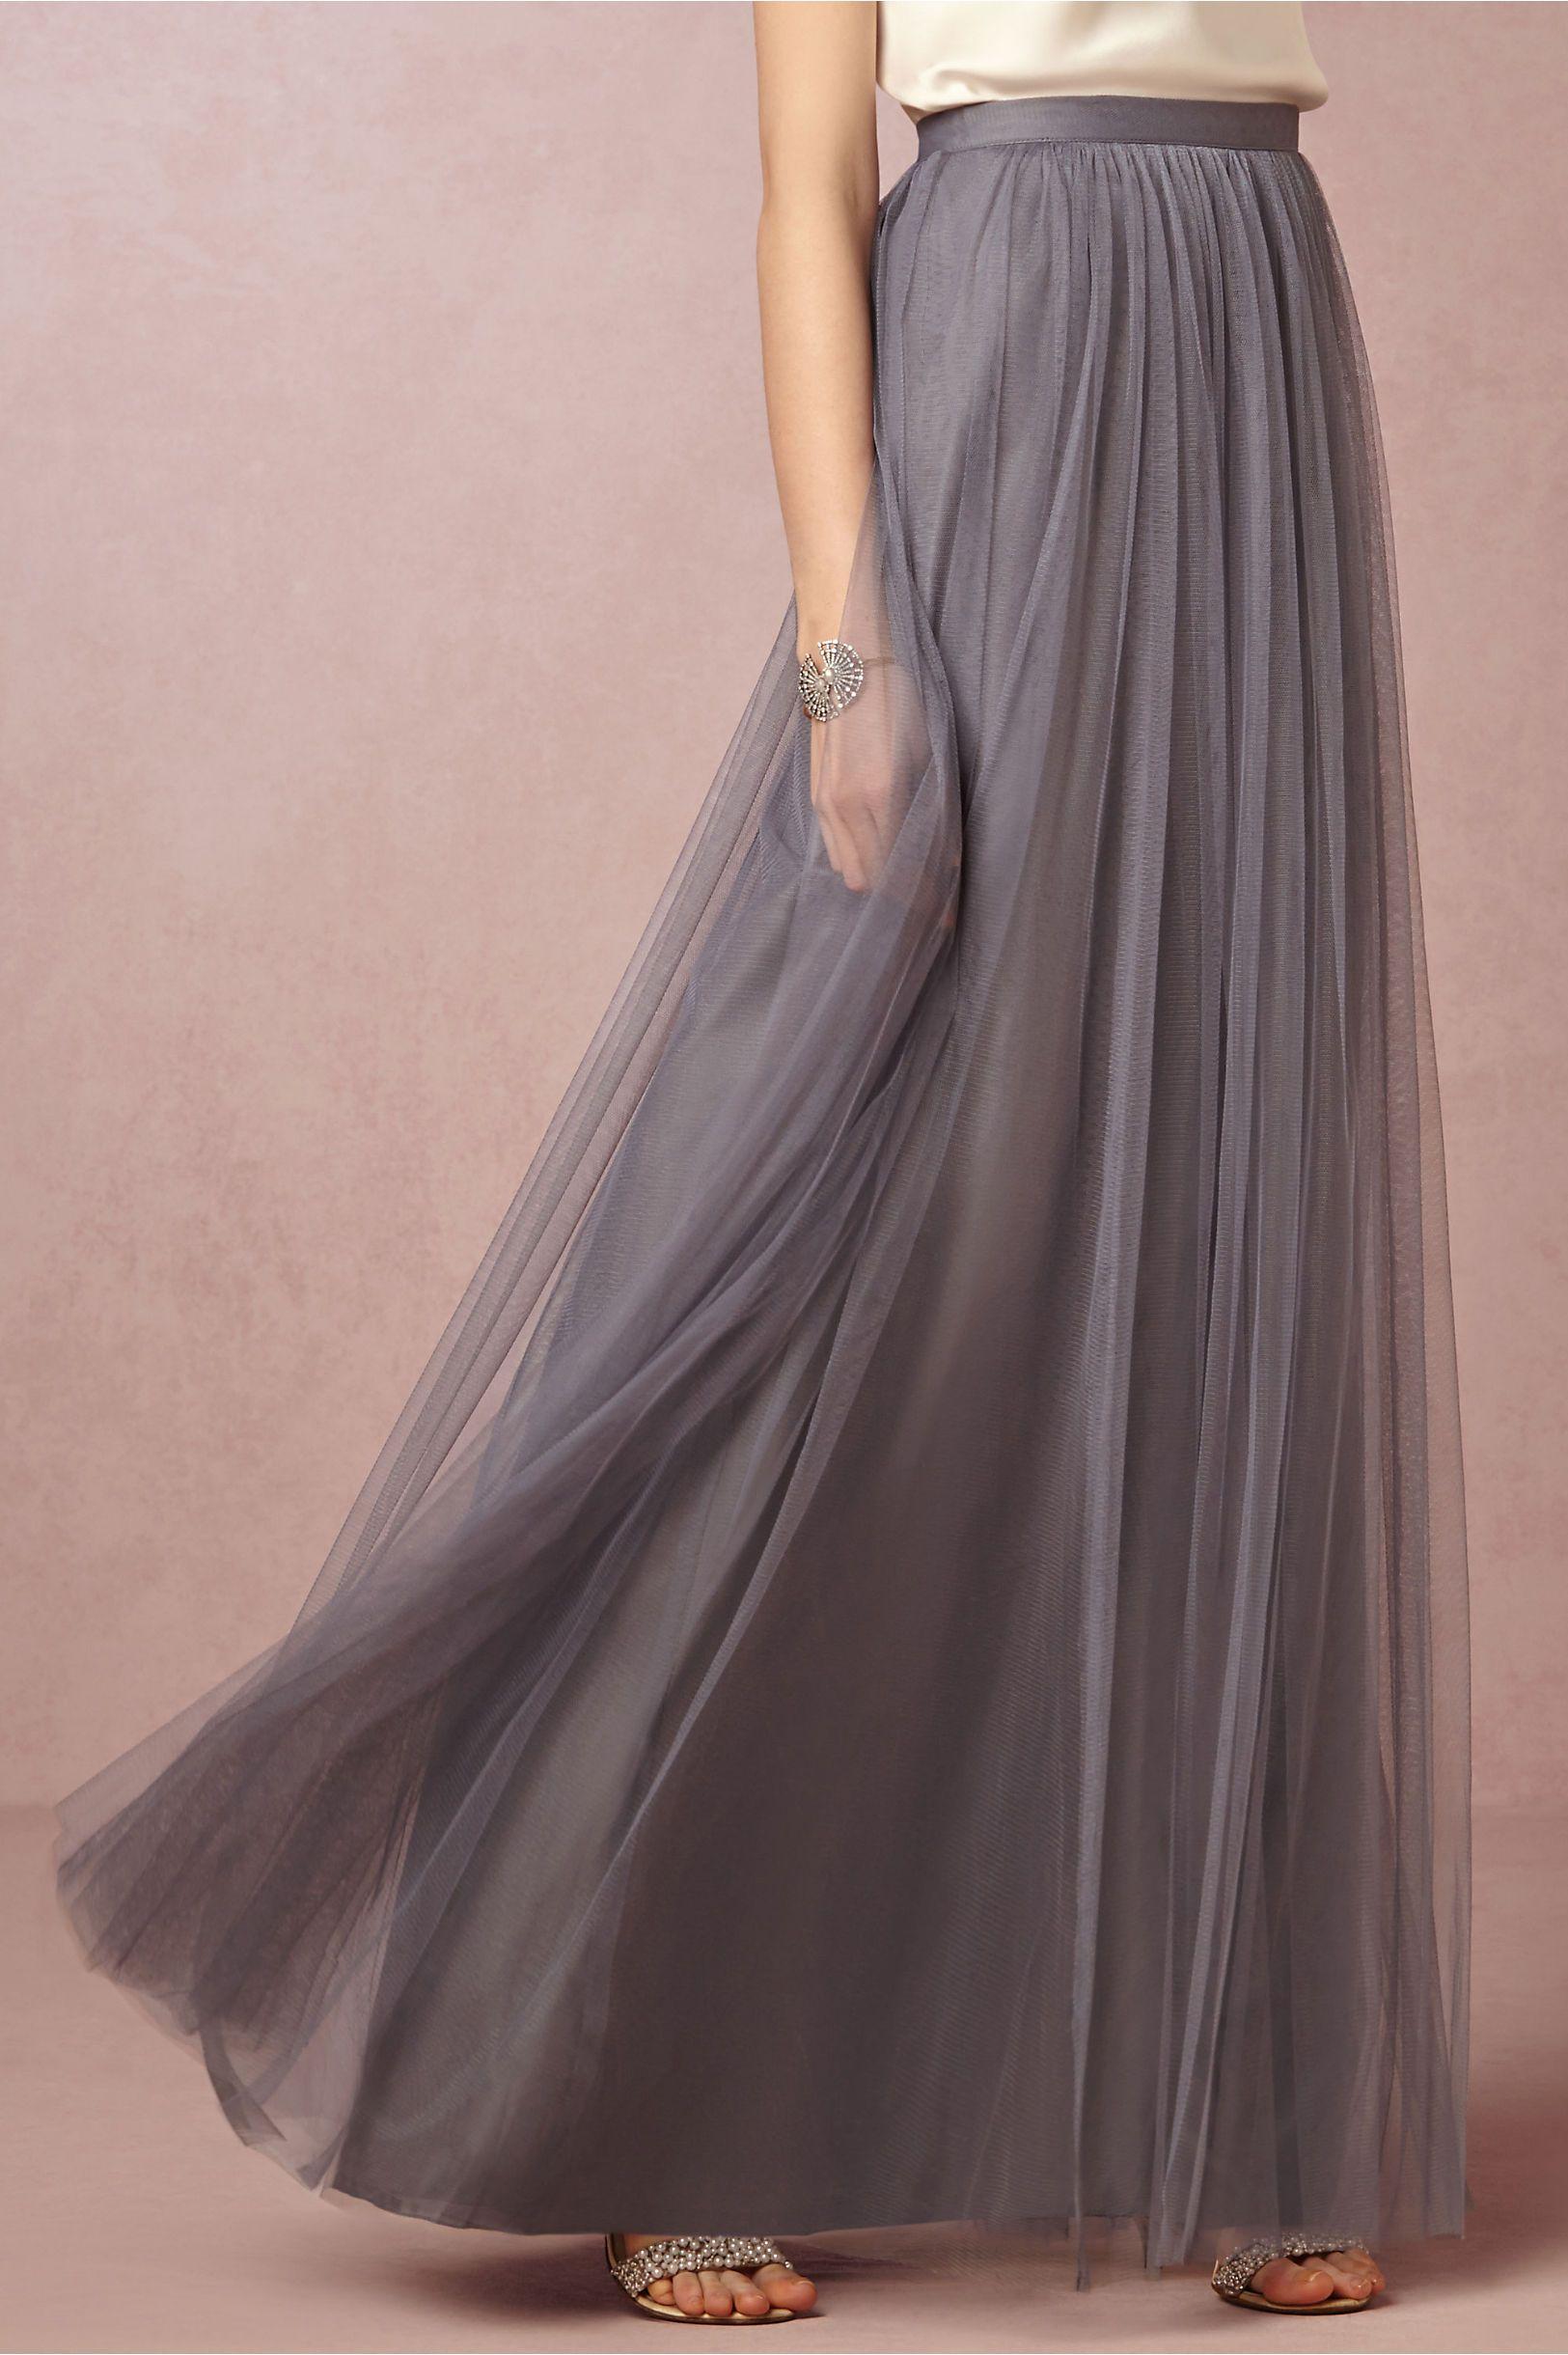 Louise tulle skirt vestidos pinterest maids tulle skirts and